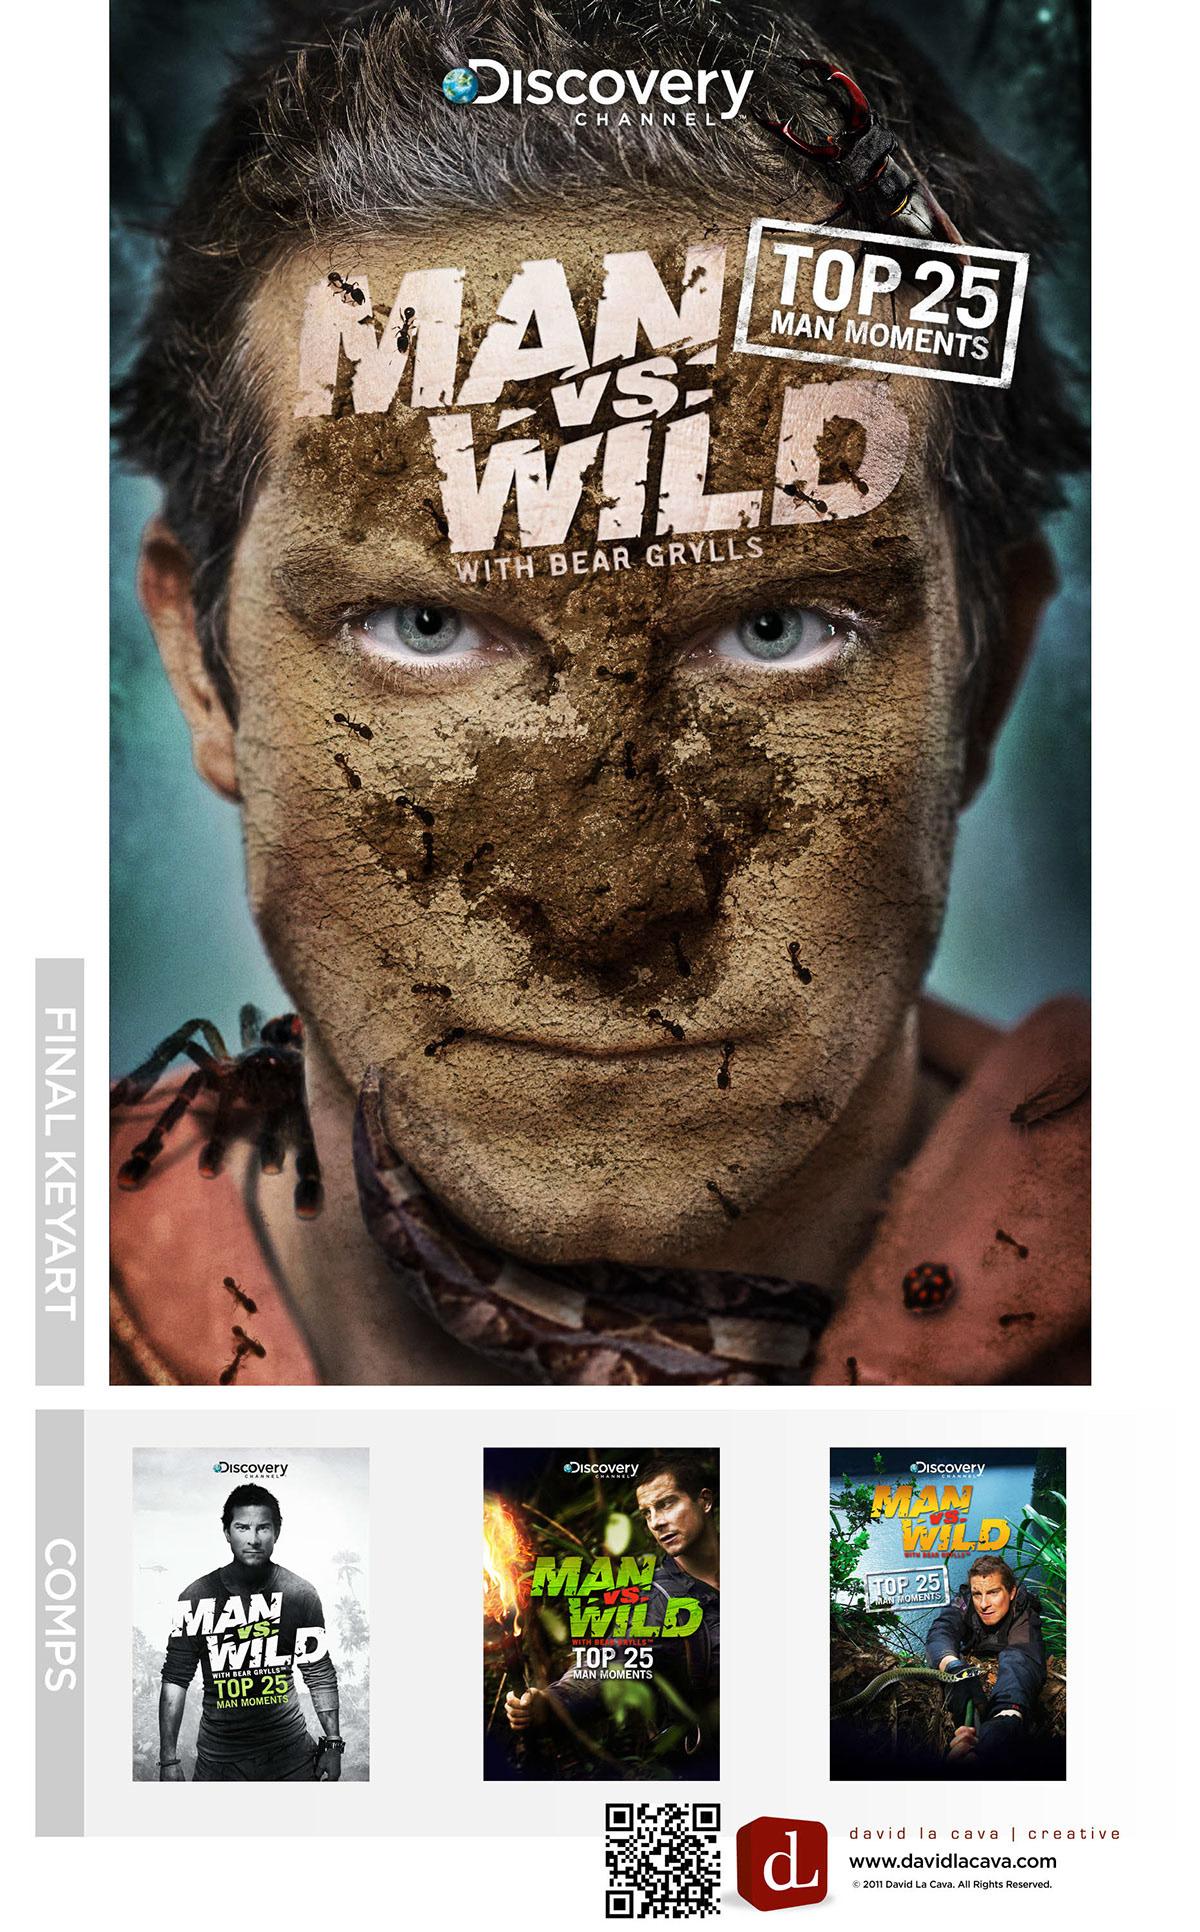 Man Vs Wild With Bear Grylls Top 25 Man Moments